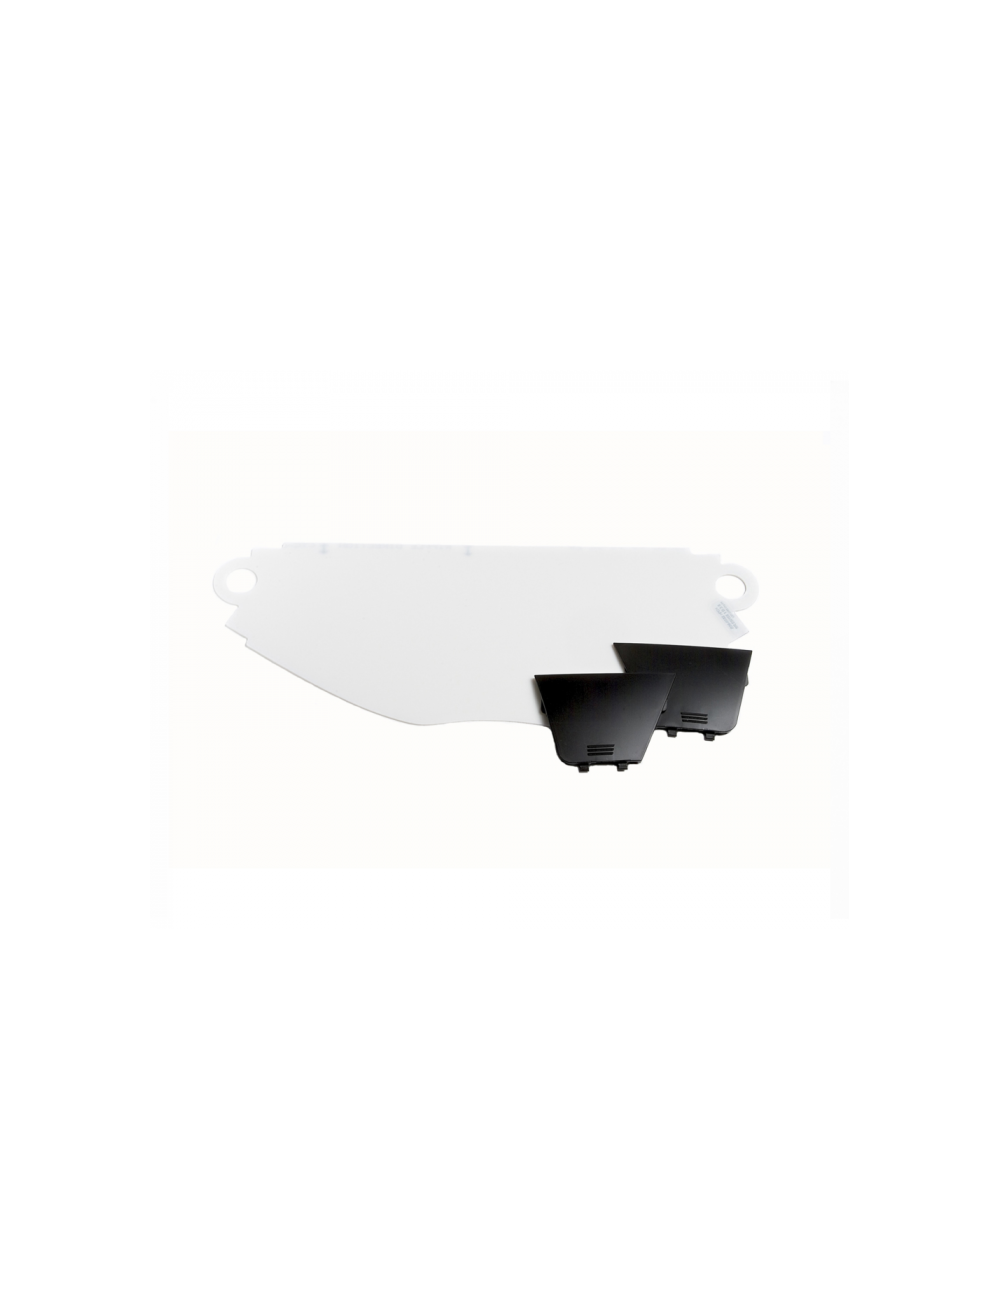 Wizjer do SR 545 Sundstrom T06-0502